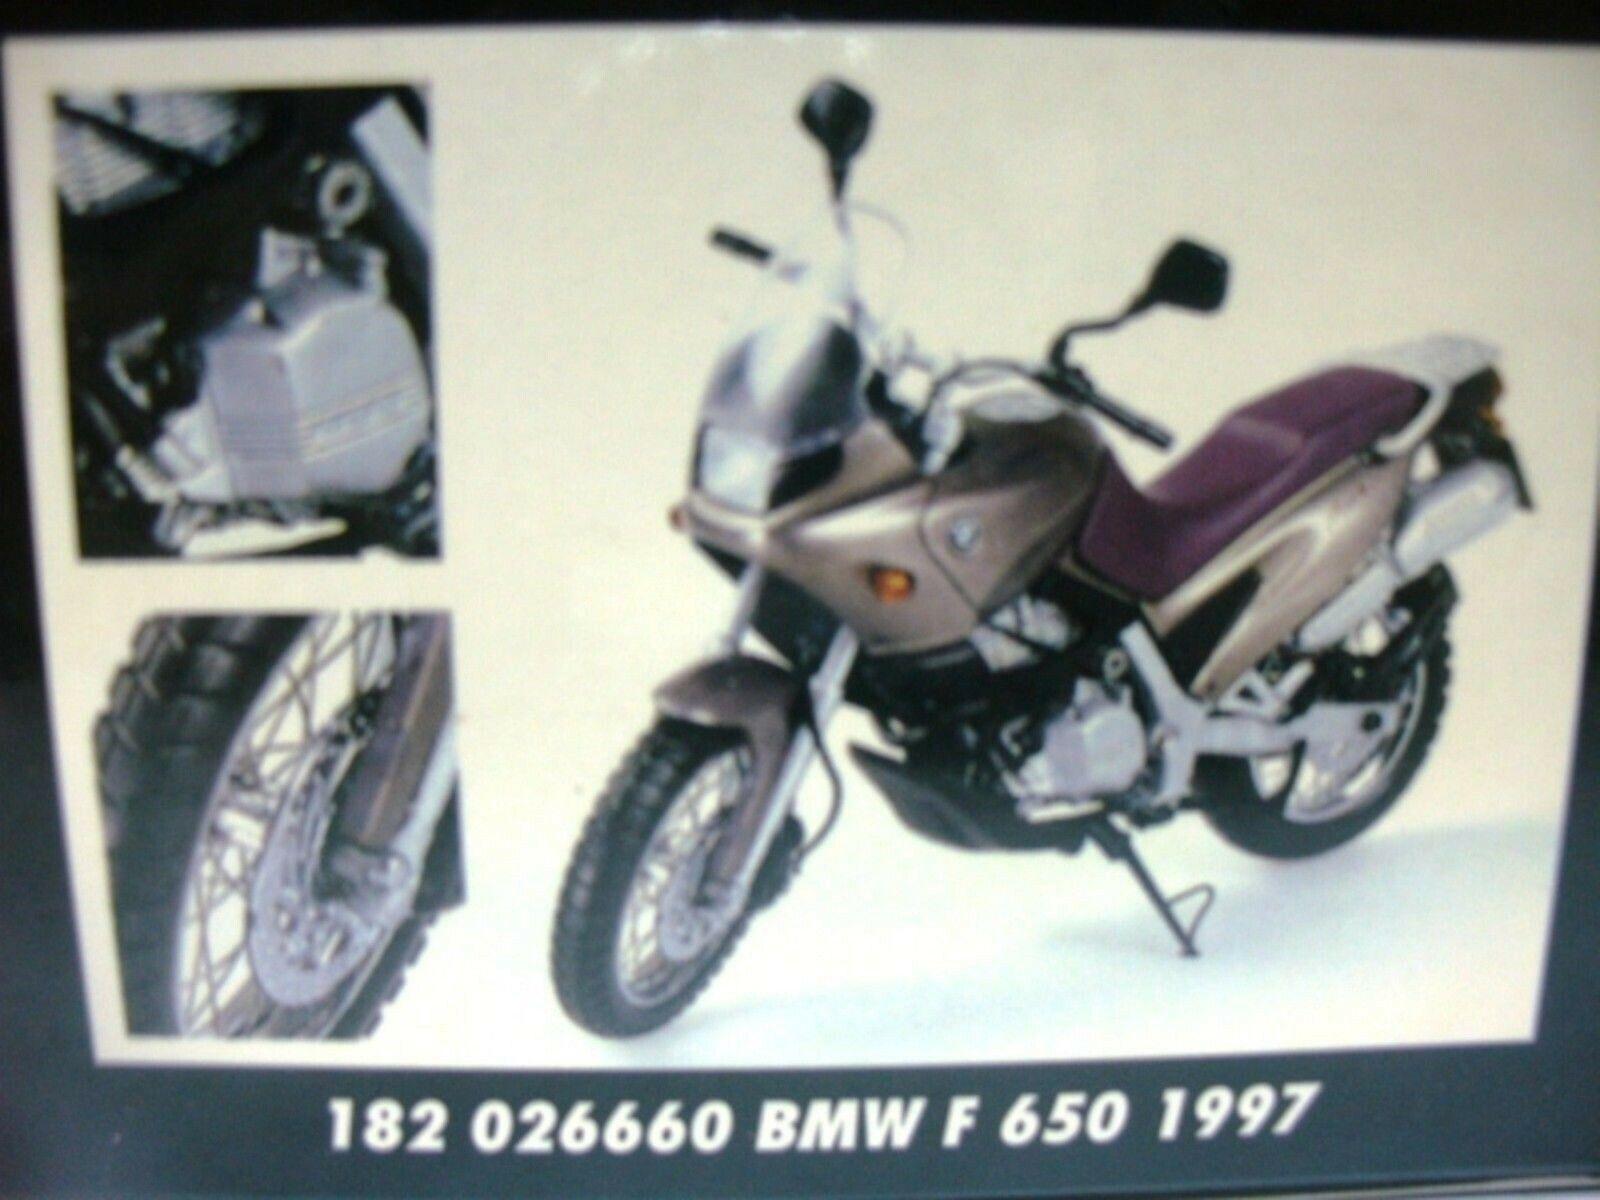 Wow extremadamente raro BMW F650 Funduro 1997 Mokka Mt 1 1 1 18 Minichamps-R1100 1200 R32 9bcc09